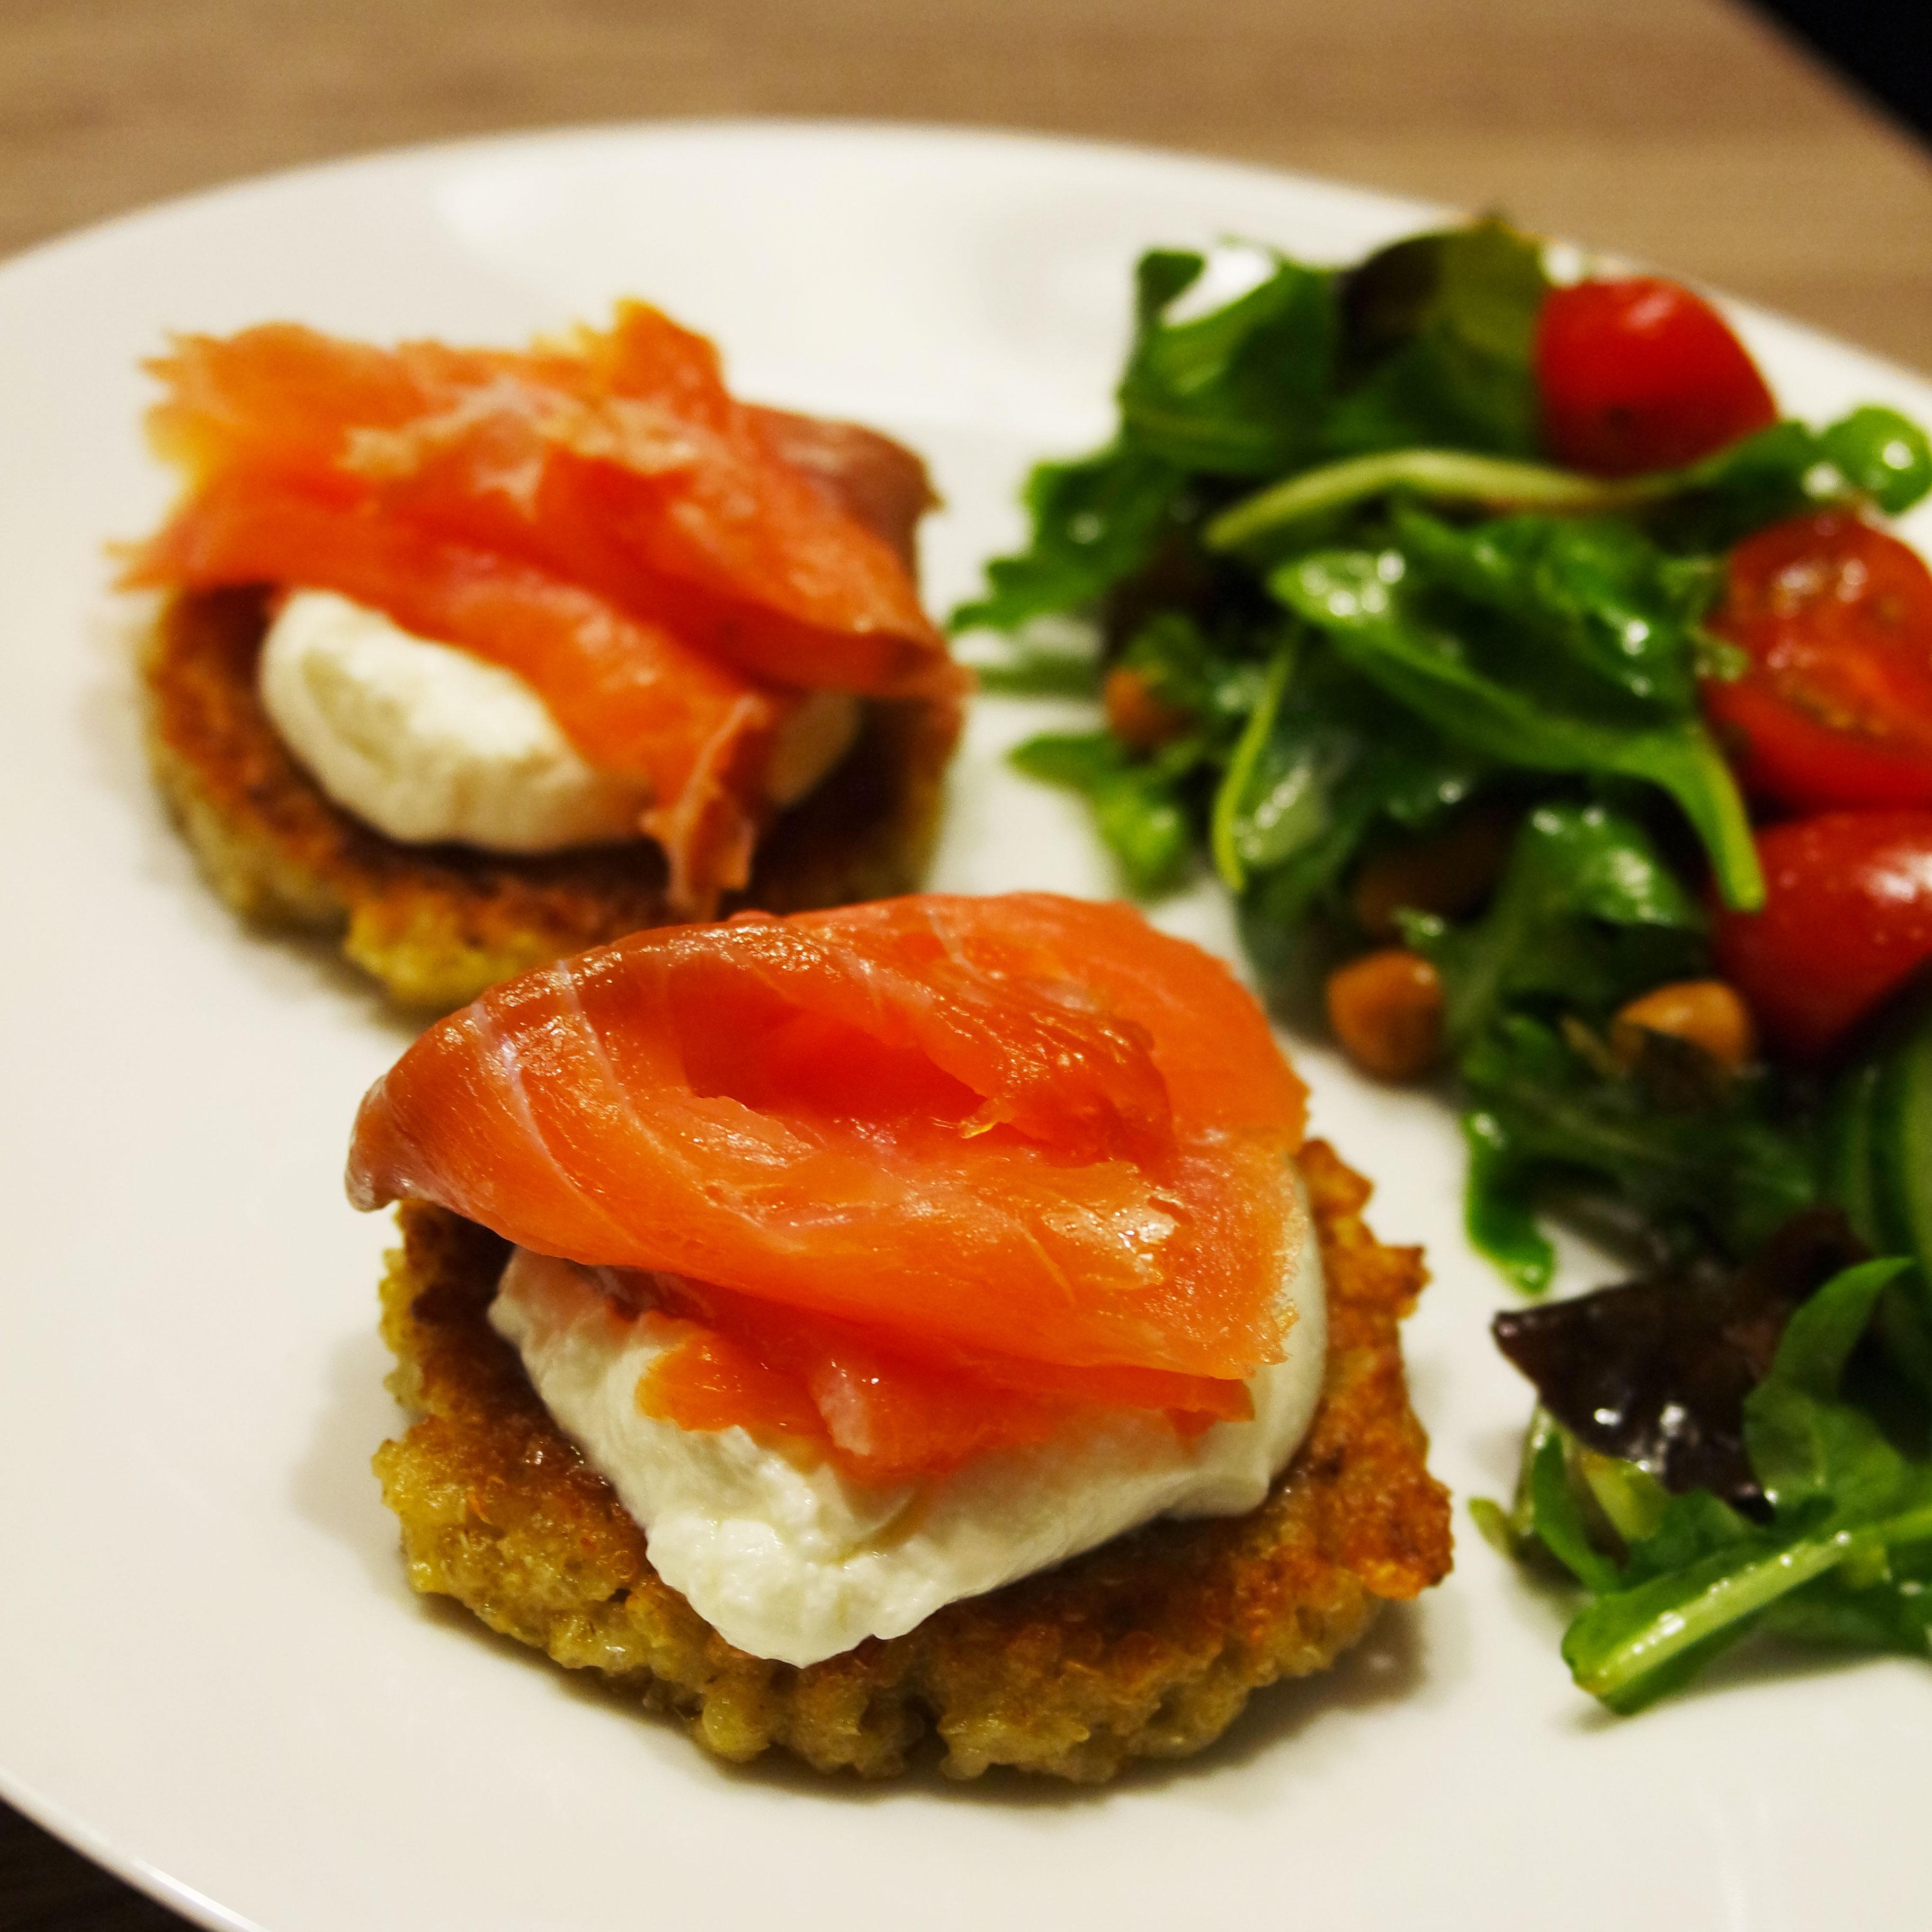 recette-facile-galette-quinoa-light-rapide-saumon-philadelphia-régime-blog-belge-recipe